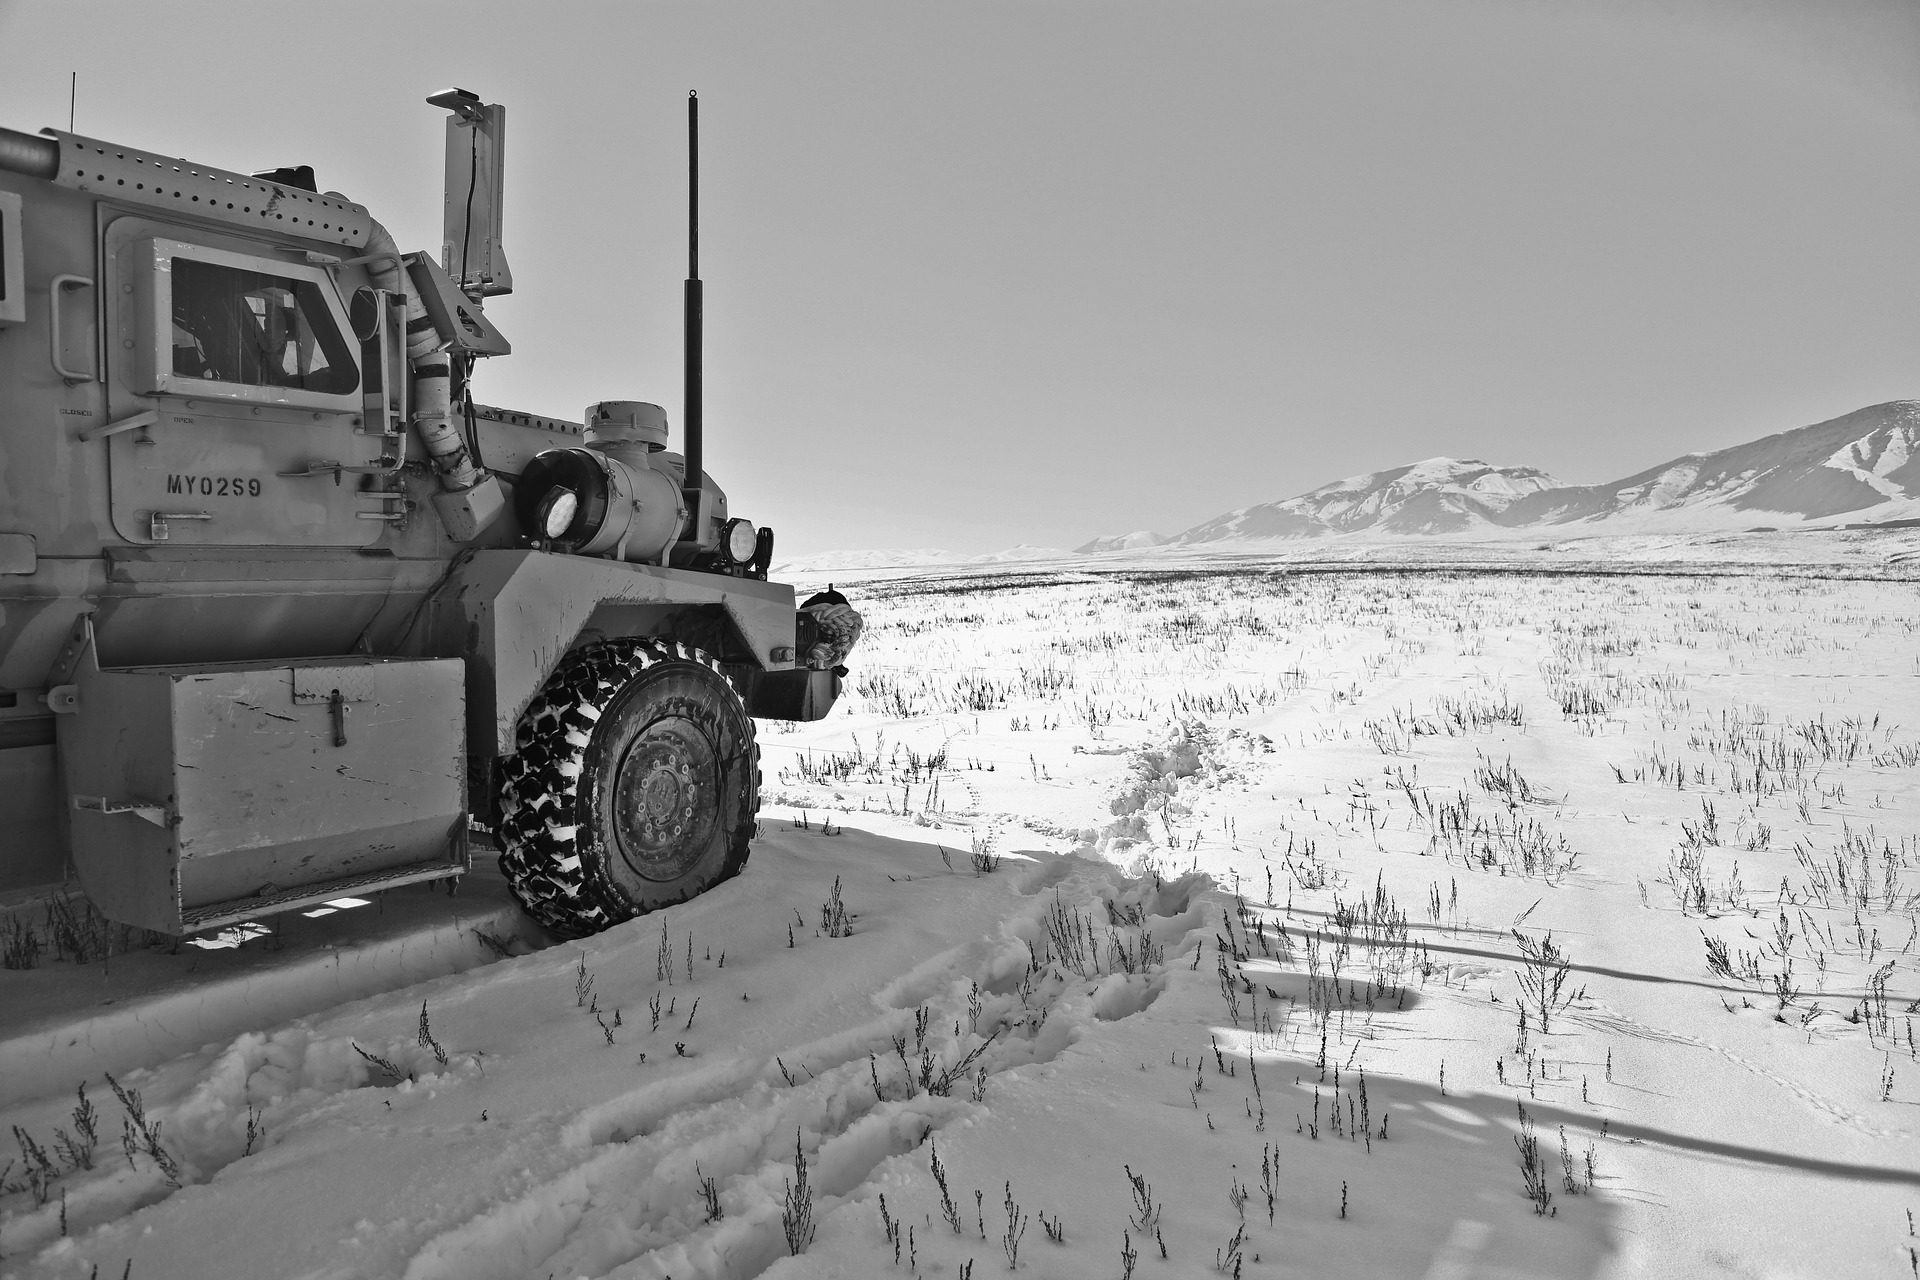 camion, Strada, Nevado, neve, Inverno, Difficoltà - Sfondi HD - Professor-falken.com